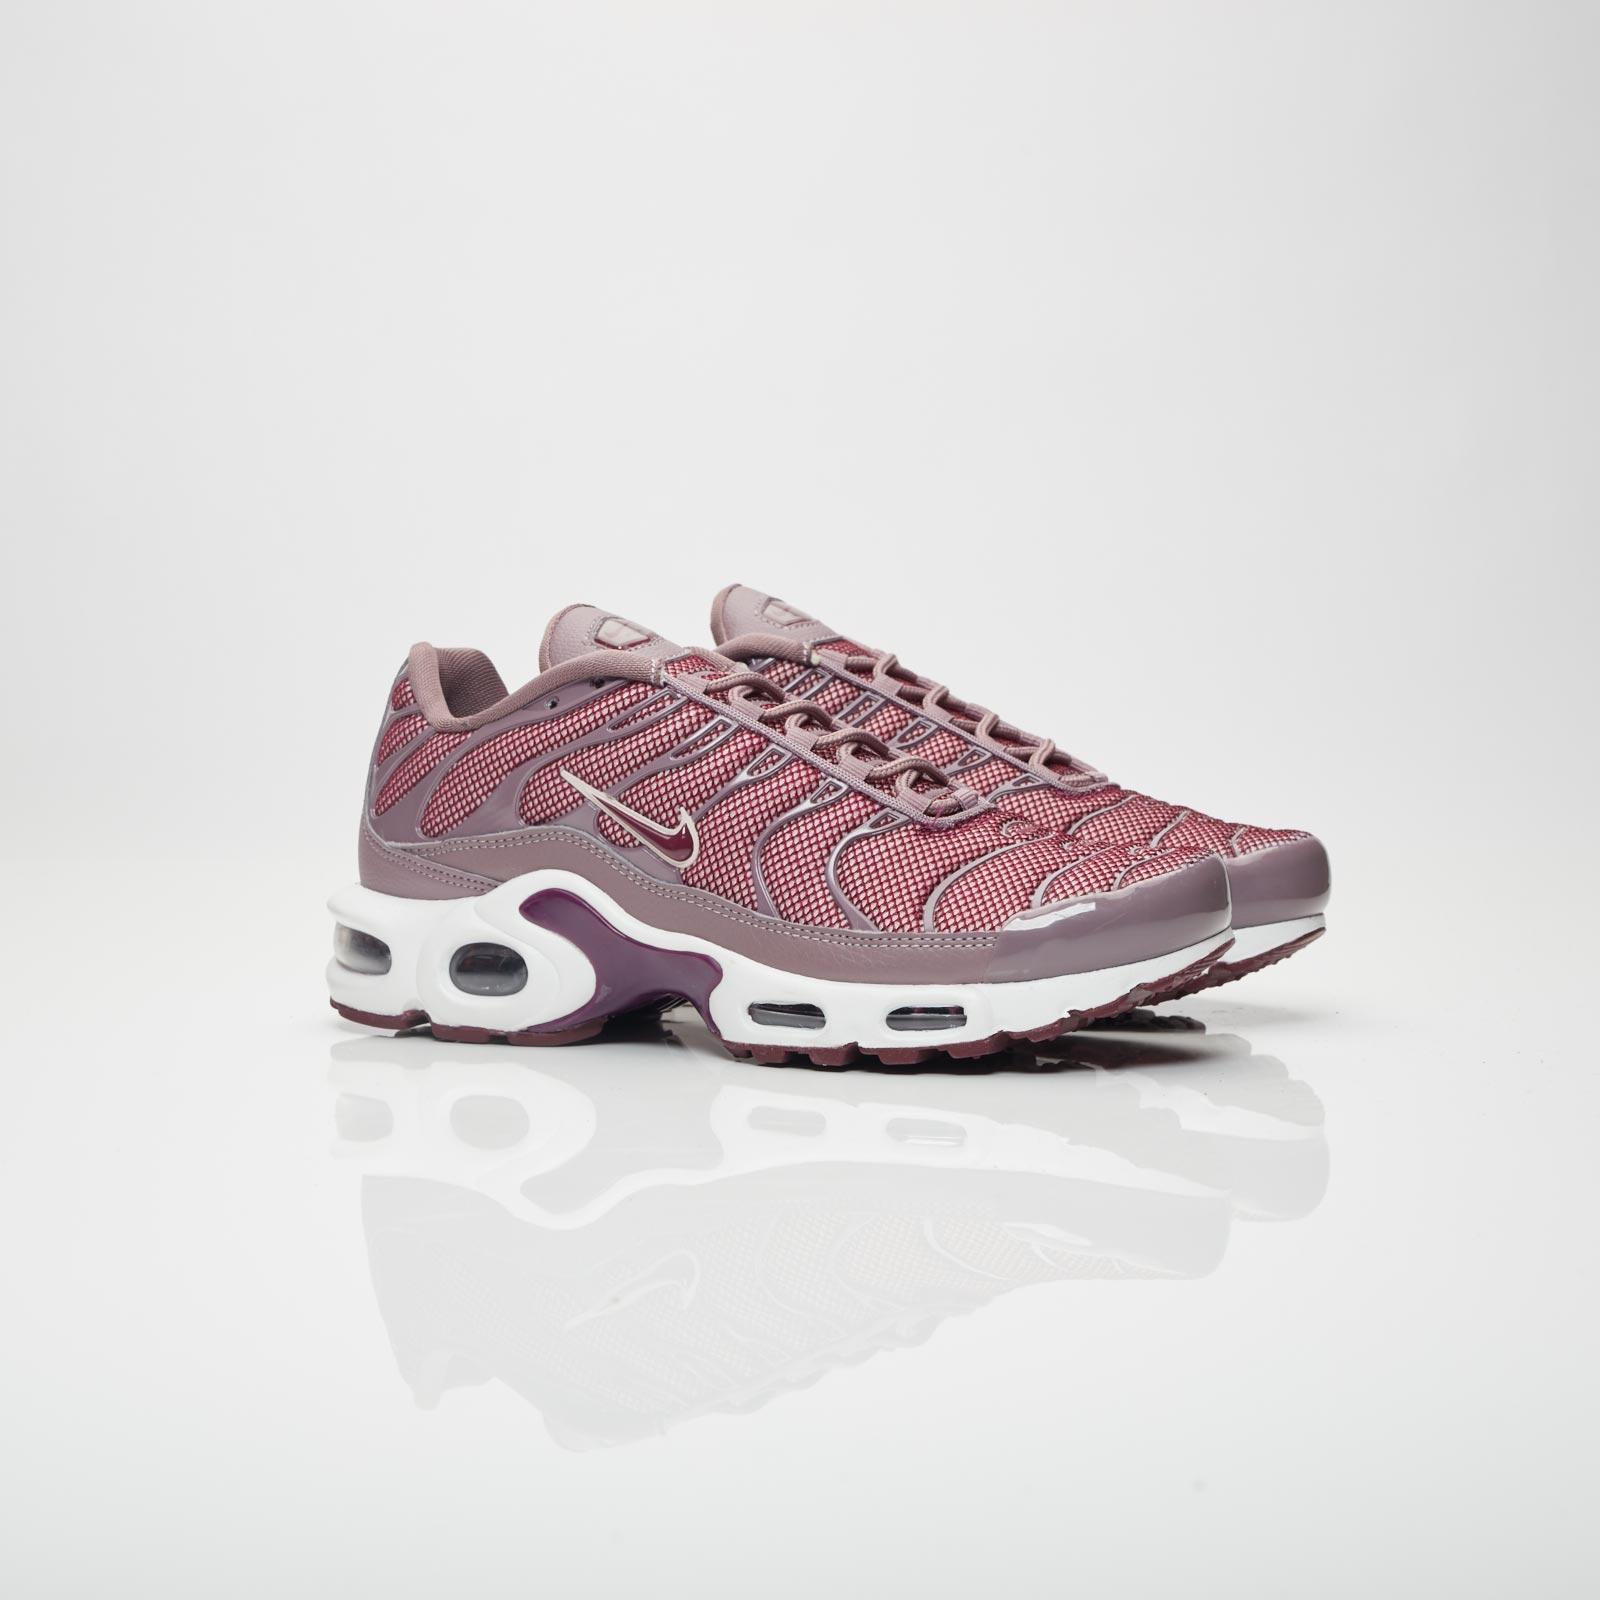 Nike Wmns Air Max Plus 605112 200 Sneakersnstuff